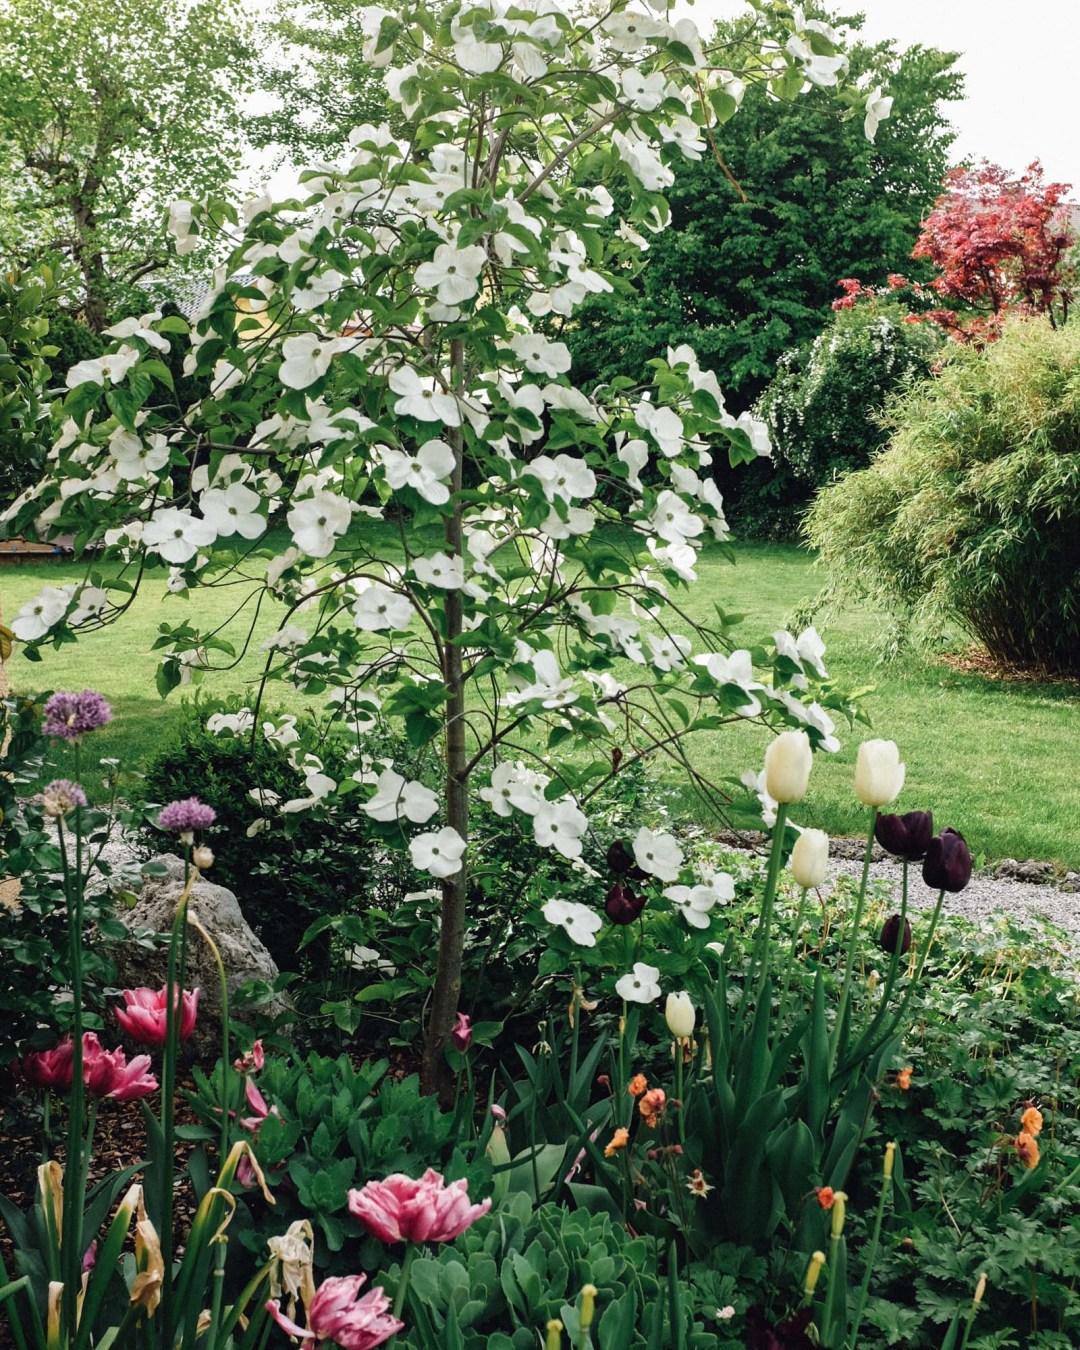 inastil, garten, blumen, rhabarbertarte, rhabarberkuchen, Spireen, Frühlingsblueten, meingarten, tarte, backen, gartendesign, gartenideen, ue50blog, gartendesign, gartenmoebel